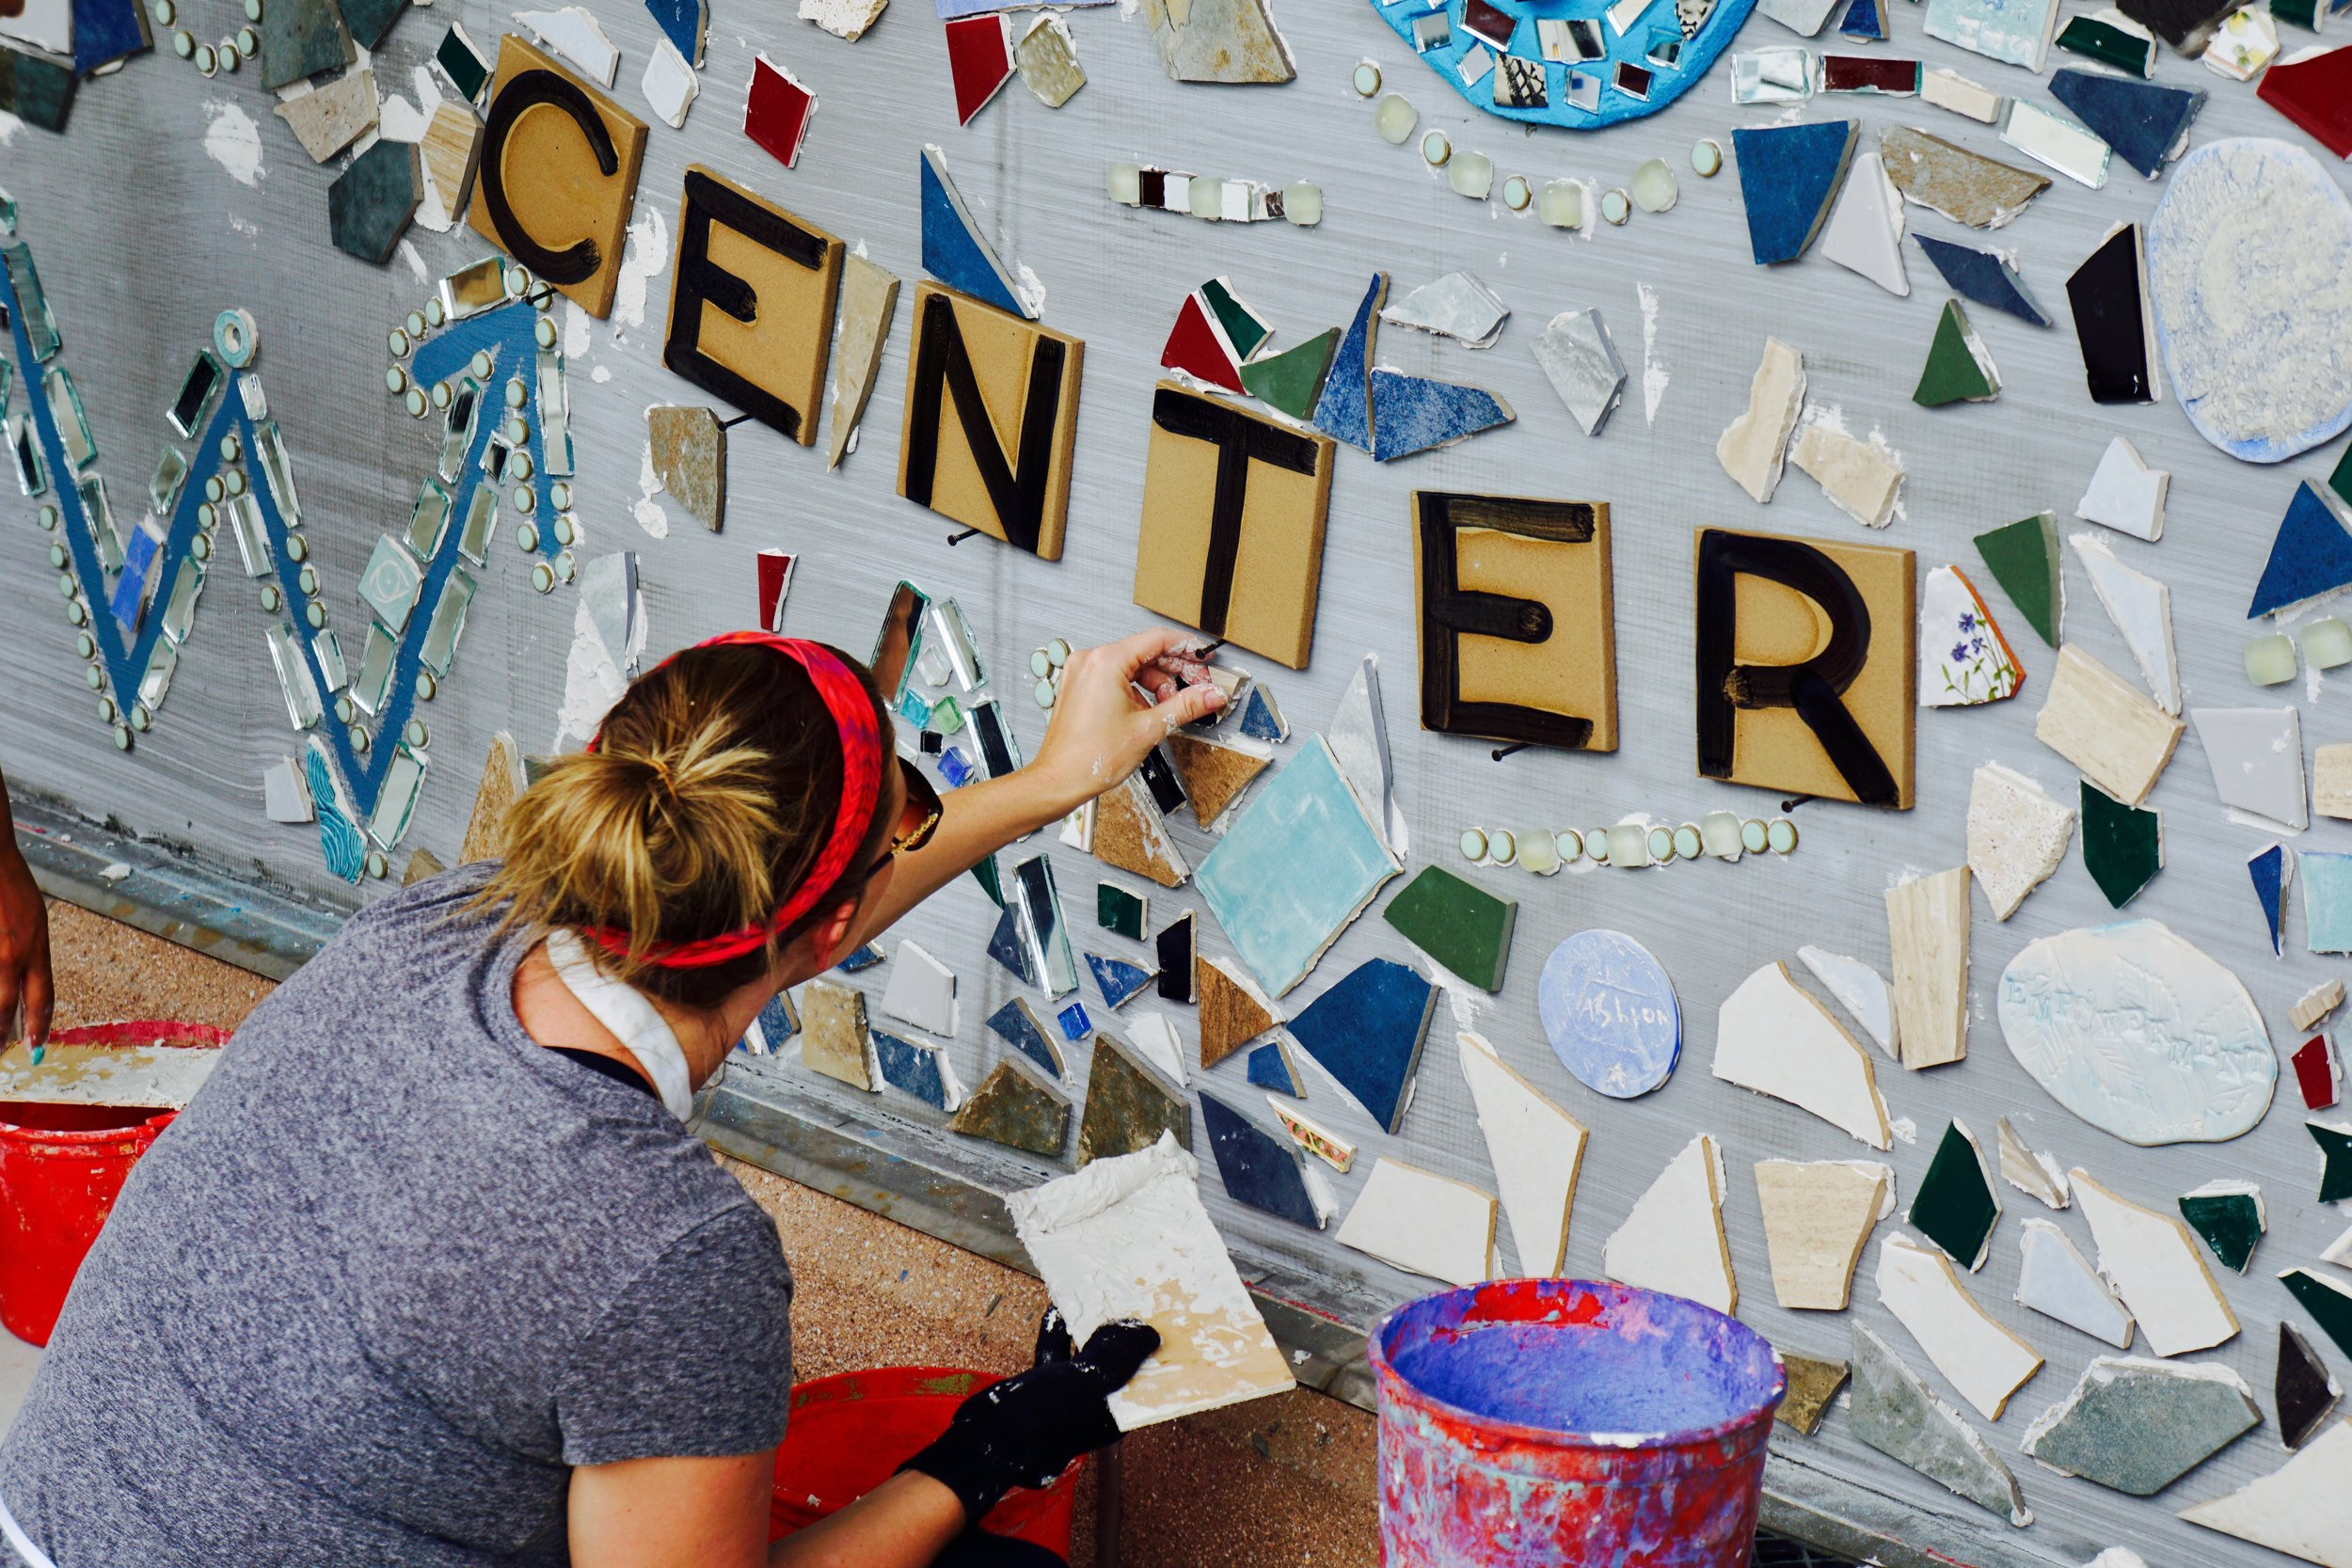 Isaiah Zagar Mosaic Mural for glassboro6.jpg